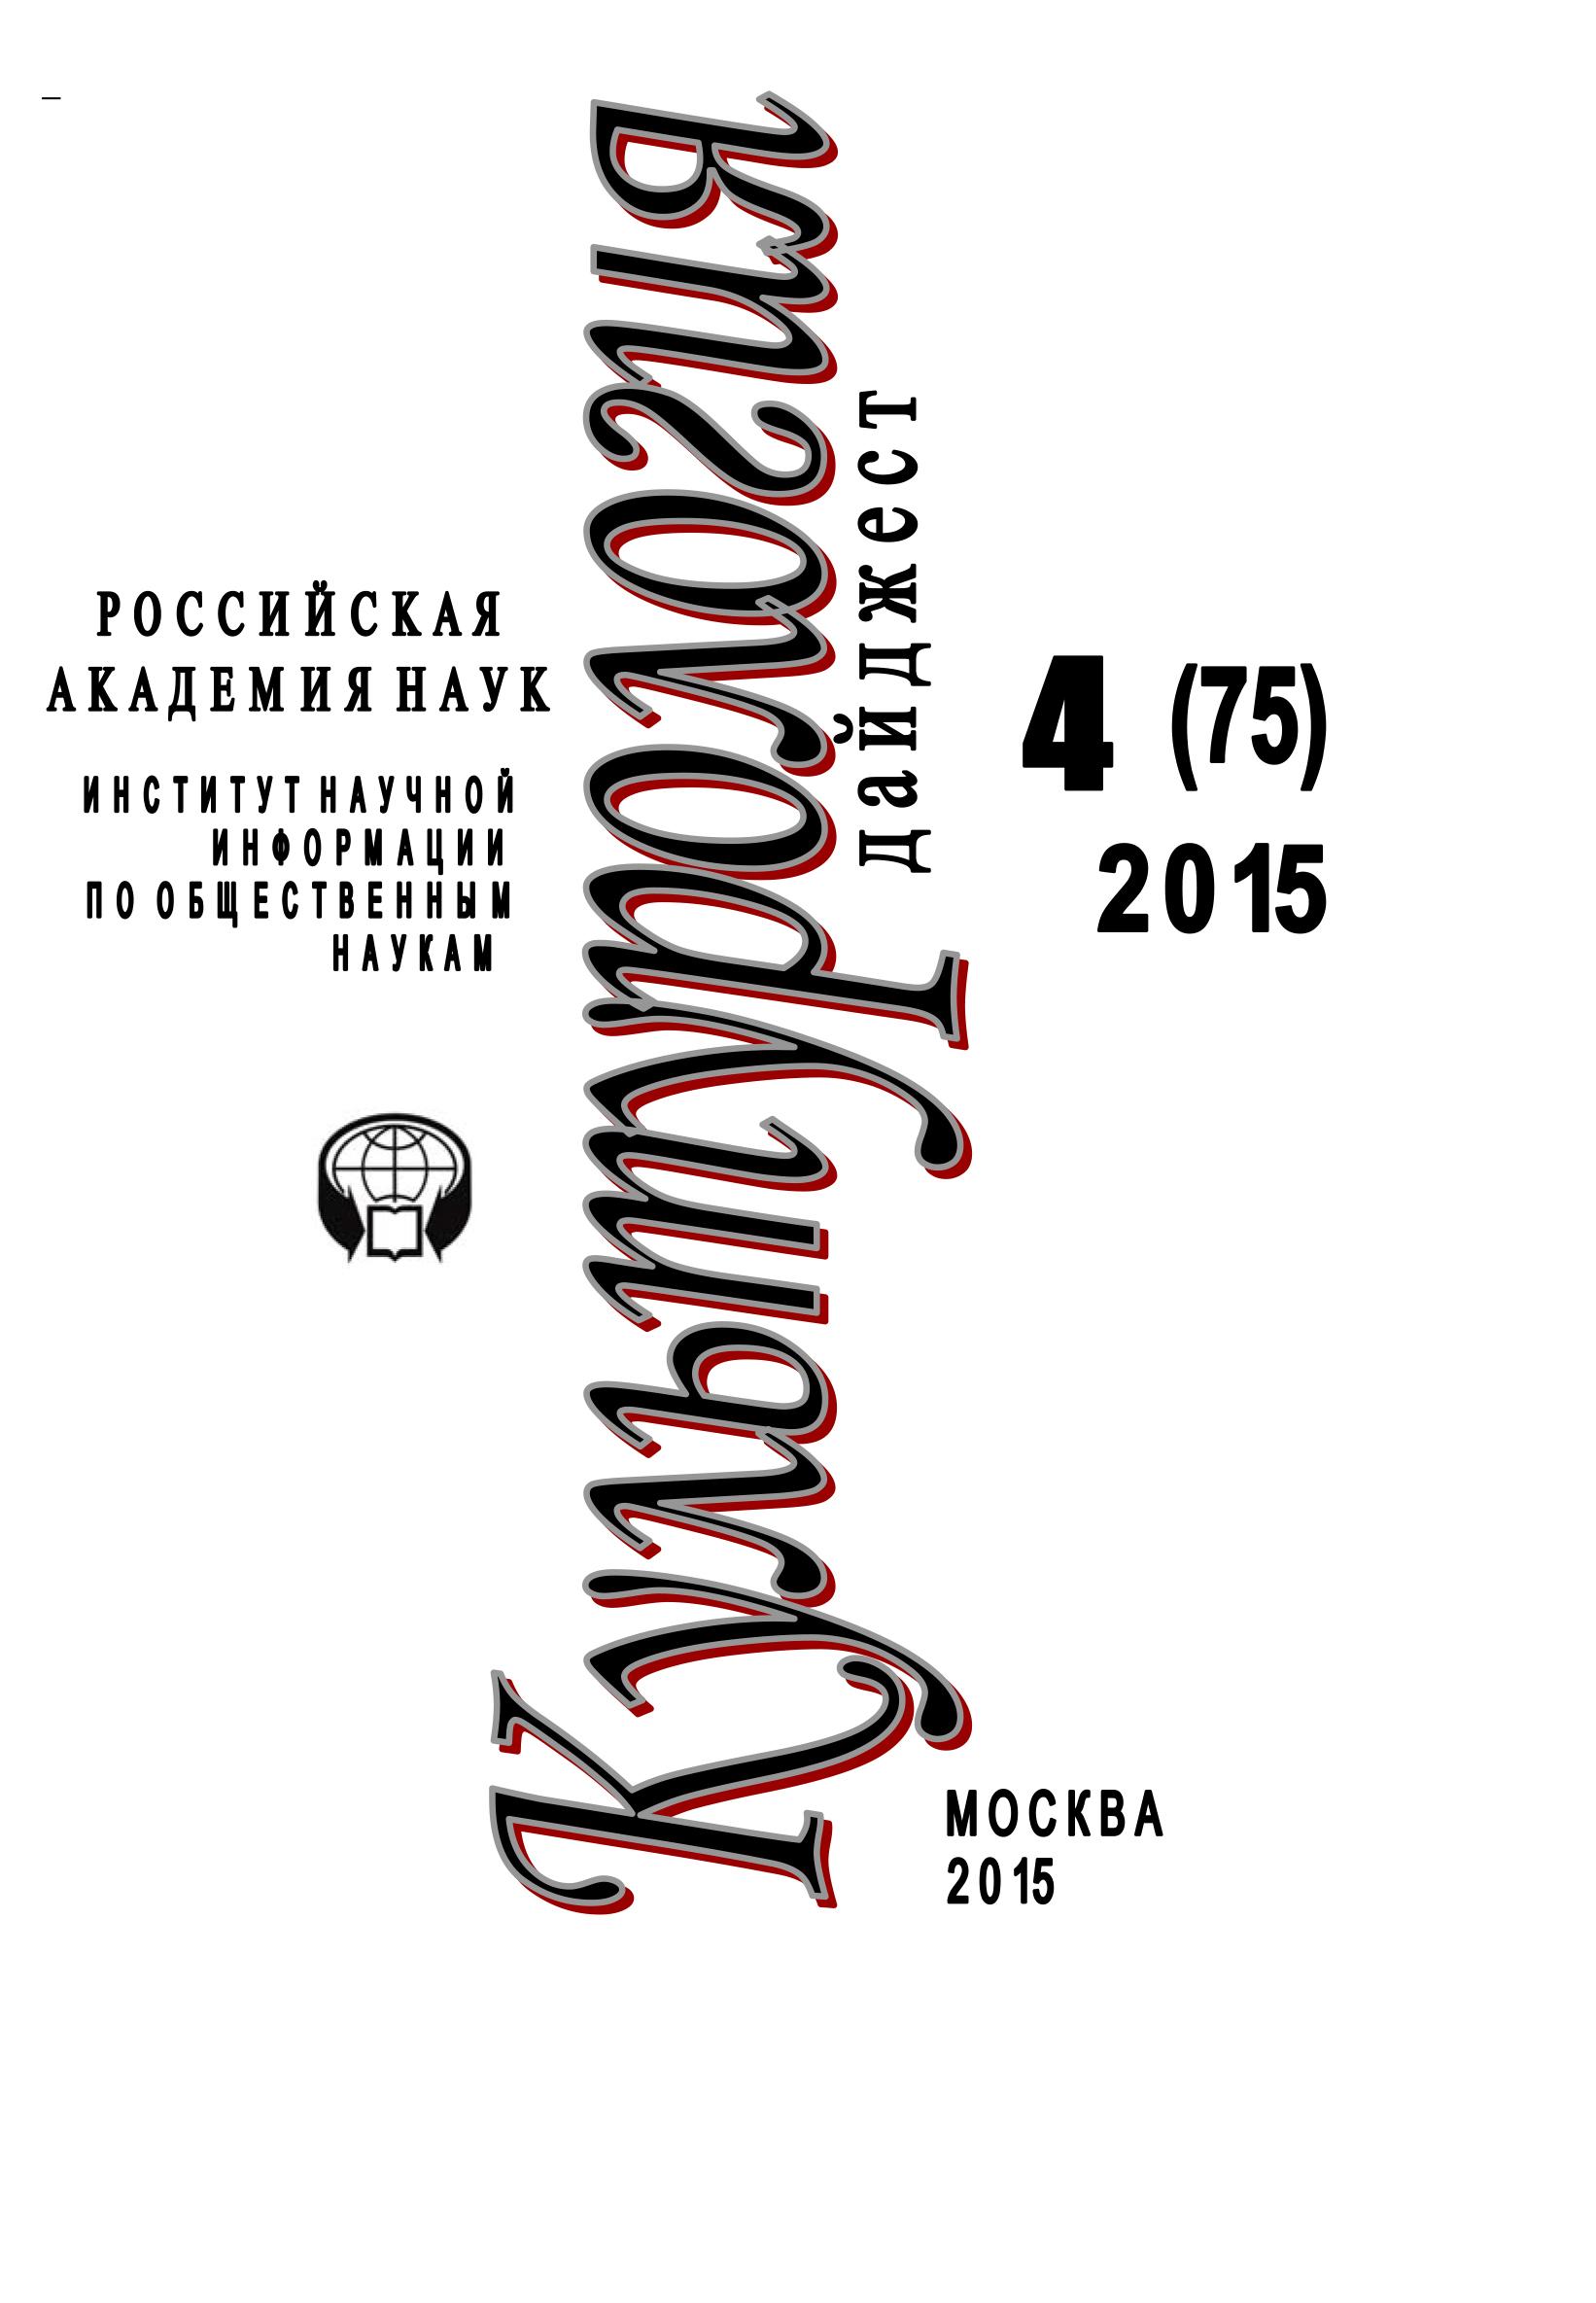 Ирина Галинская Культурология. Дайджест №4 / 2015 ирина галинская культурология дайджест 1 2015